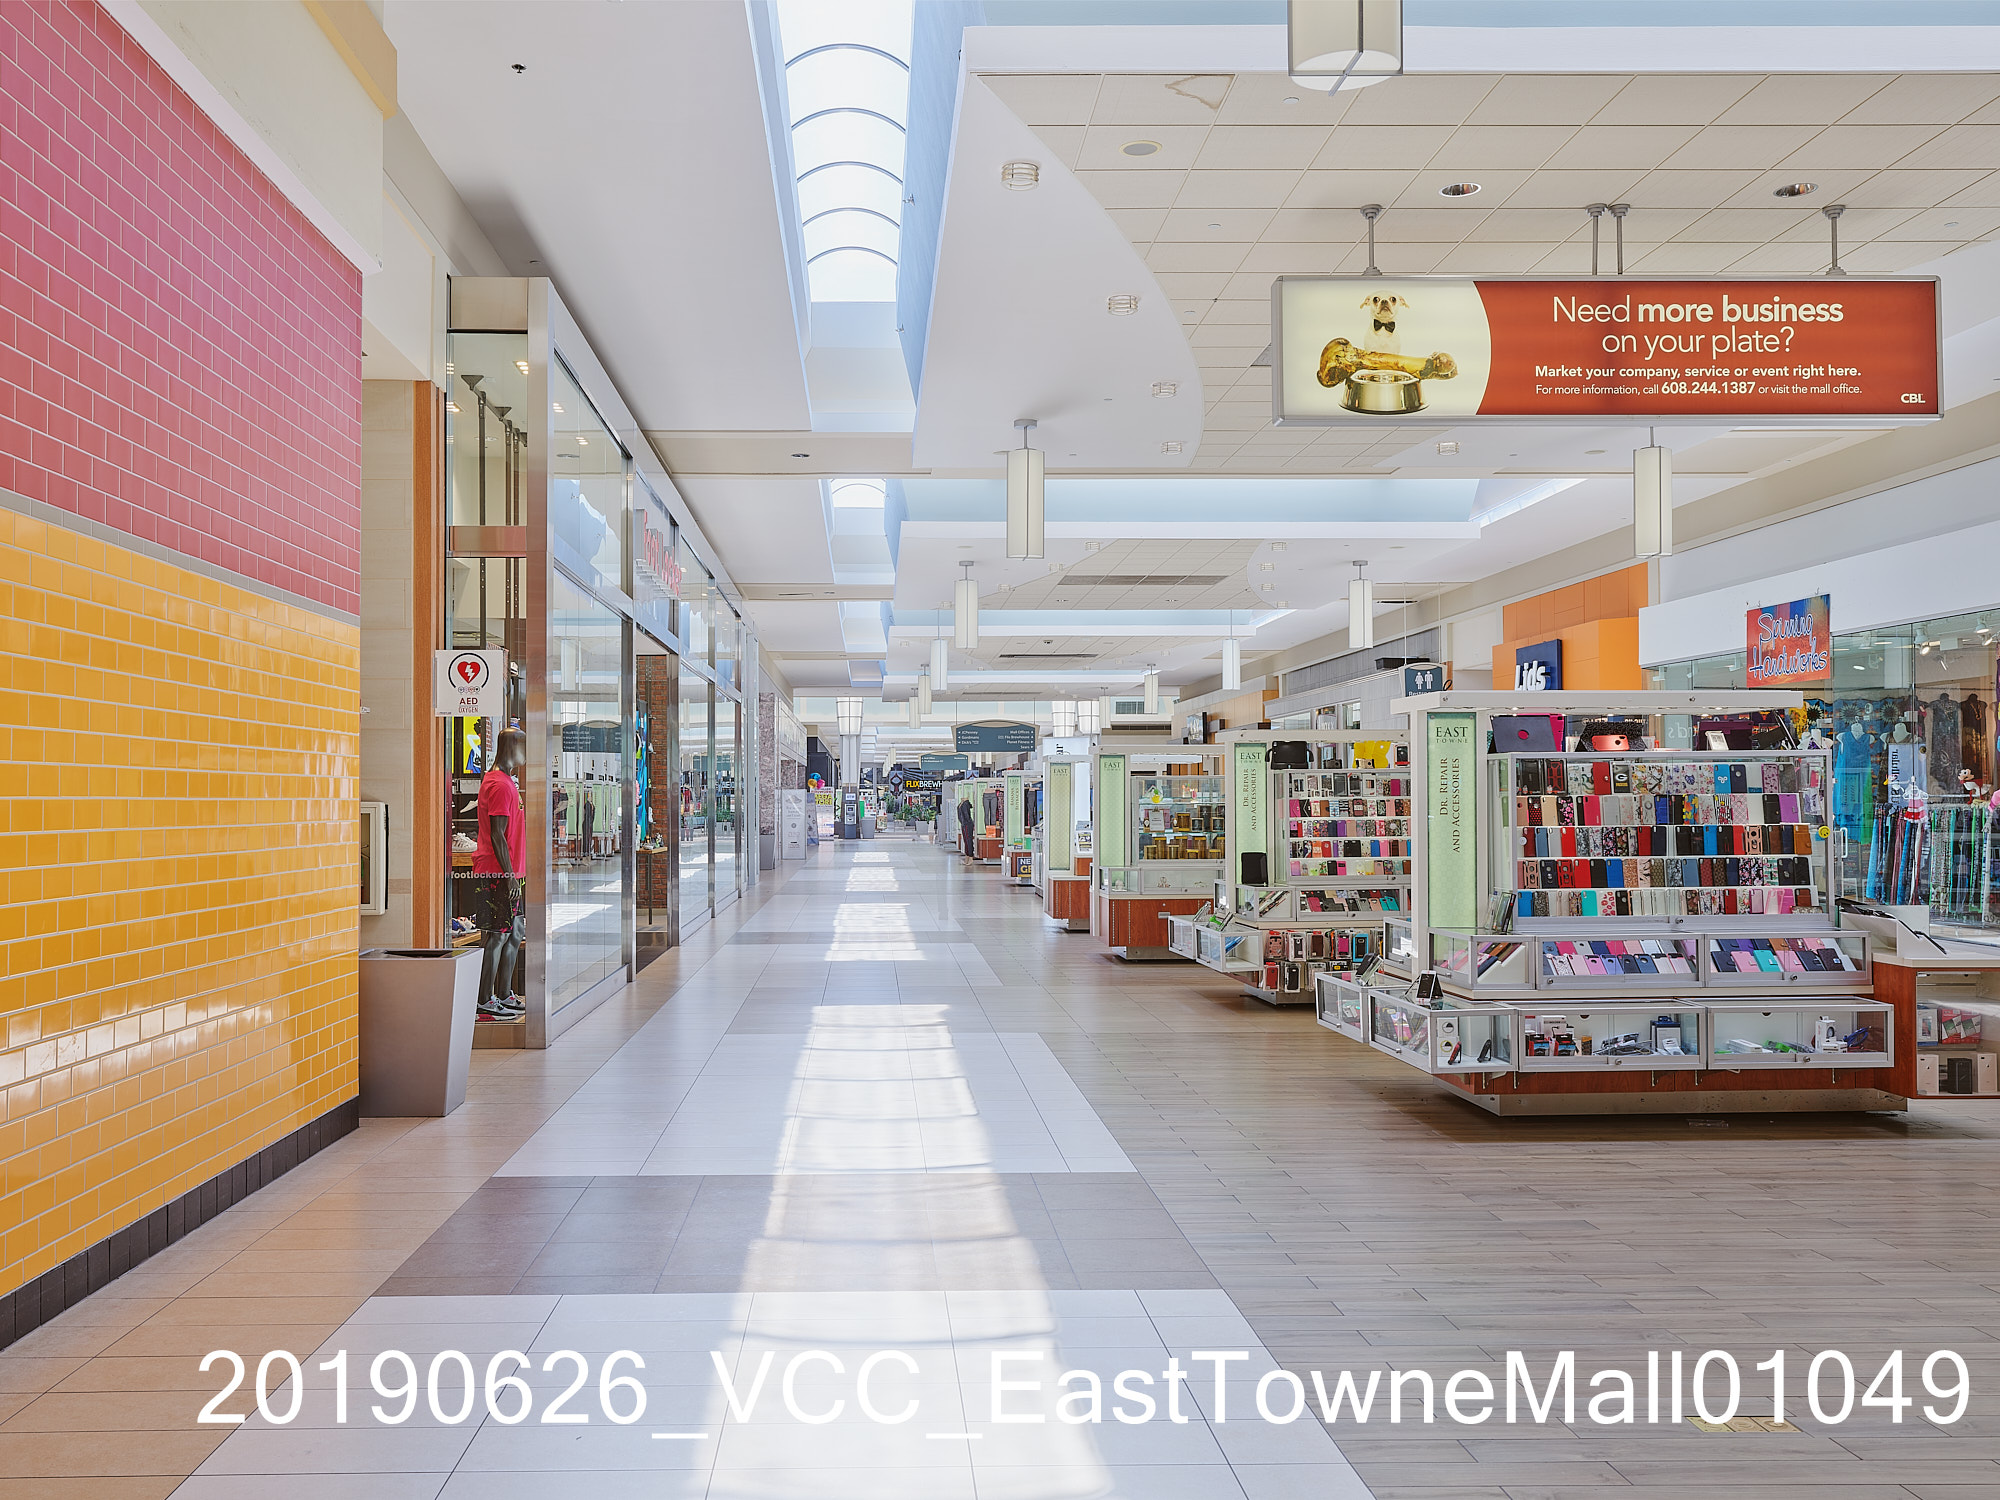 20190626_VCC_EastTowneMall01049.jpg